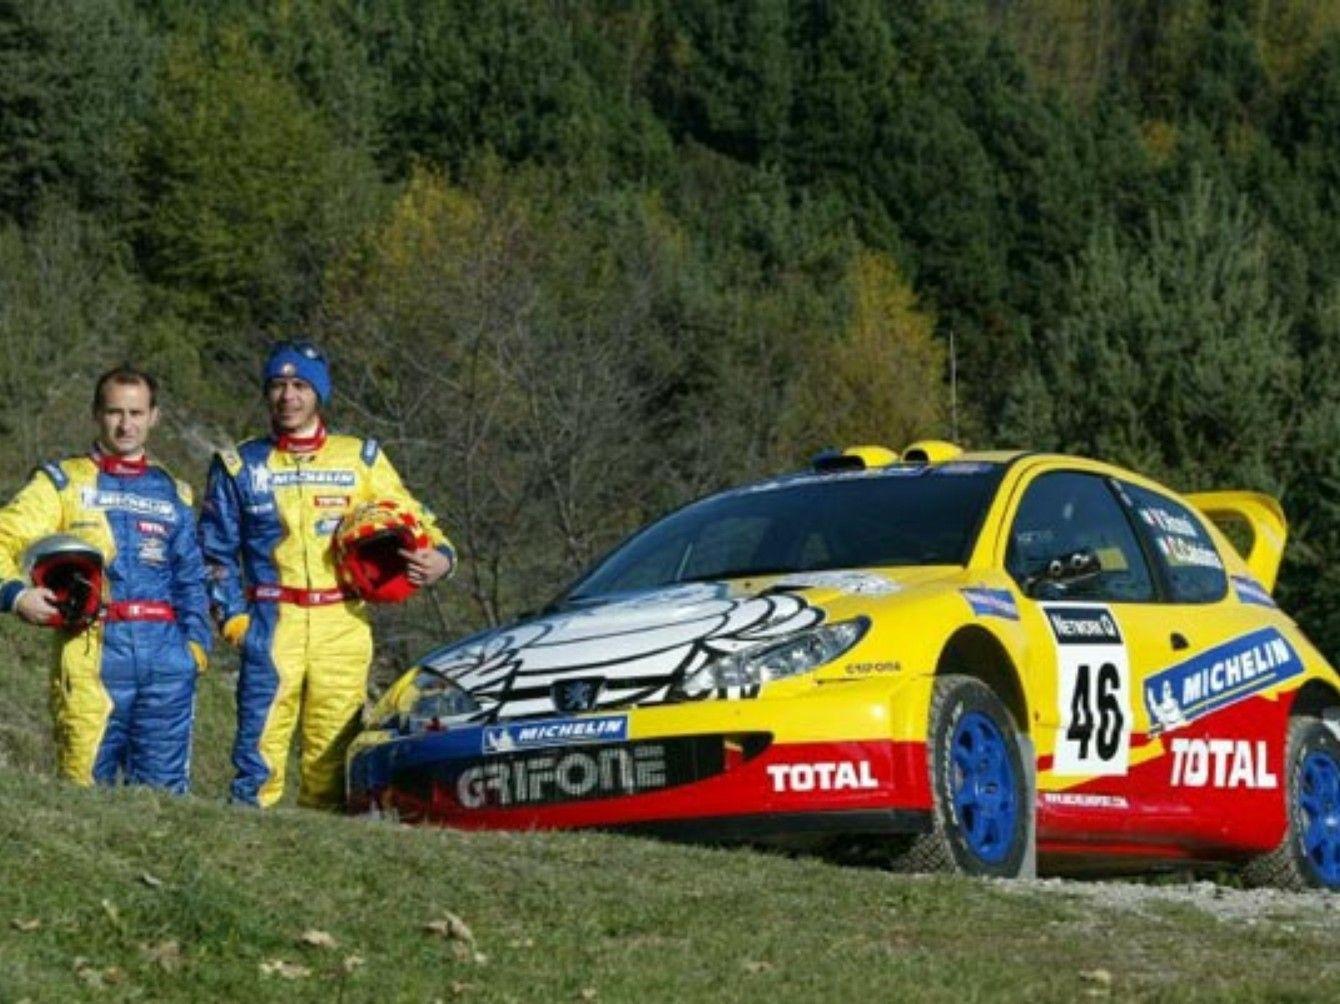 Pin Oleh Poetrysolo 46 Di Monza Rally